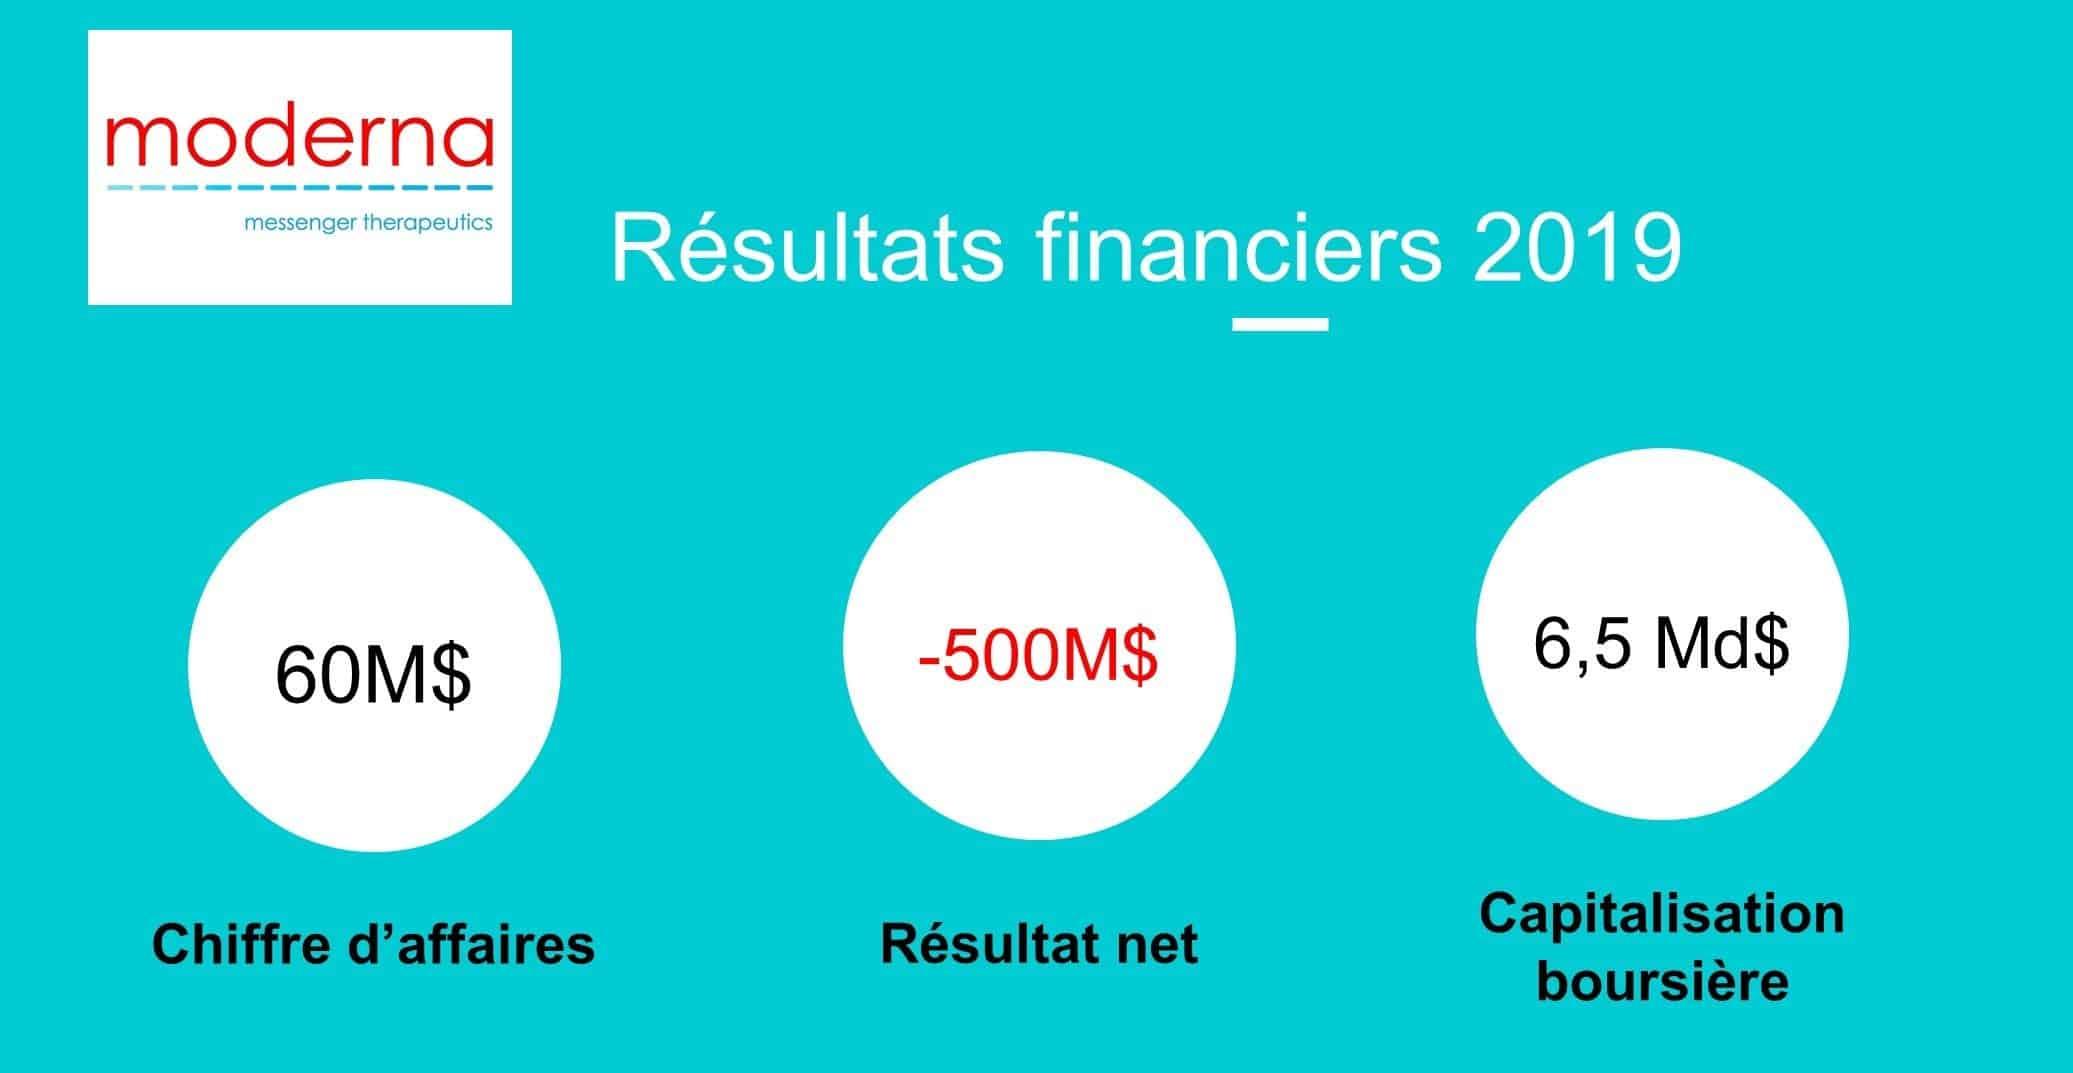 Moderna résultats financiers 2019